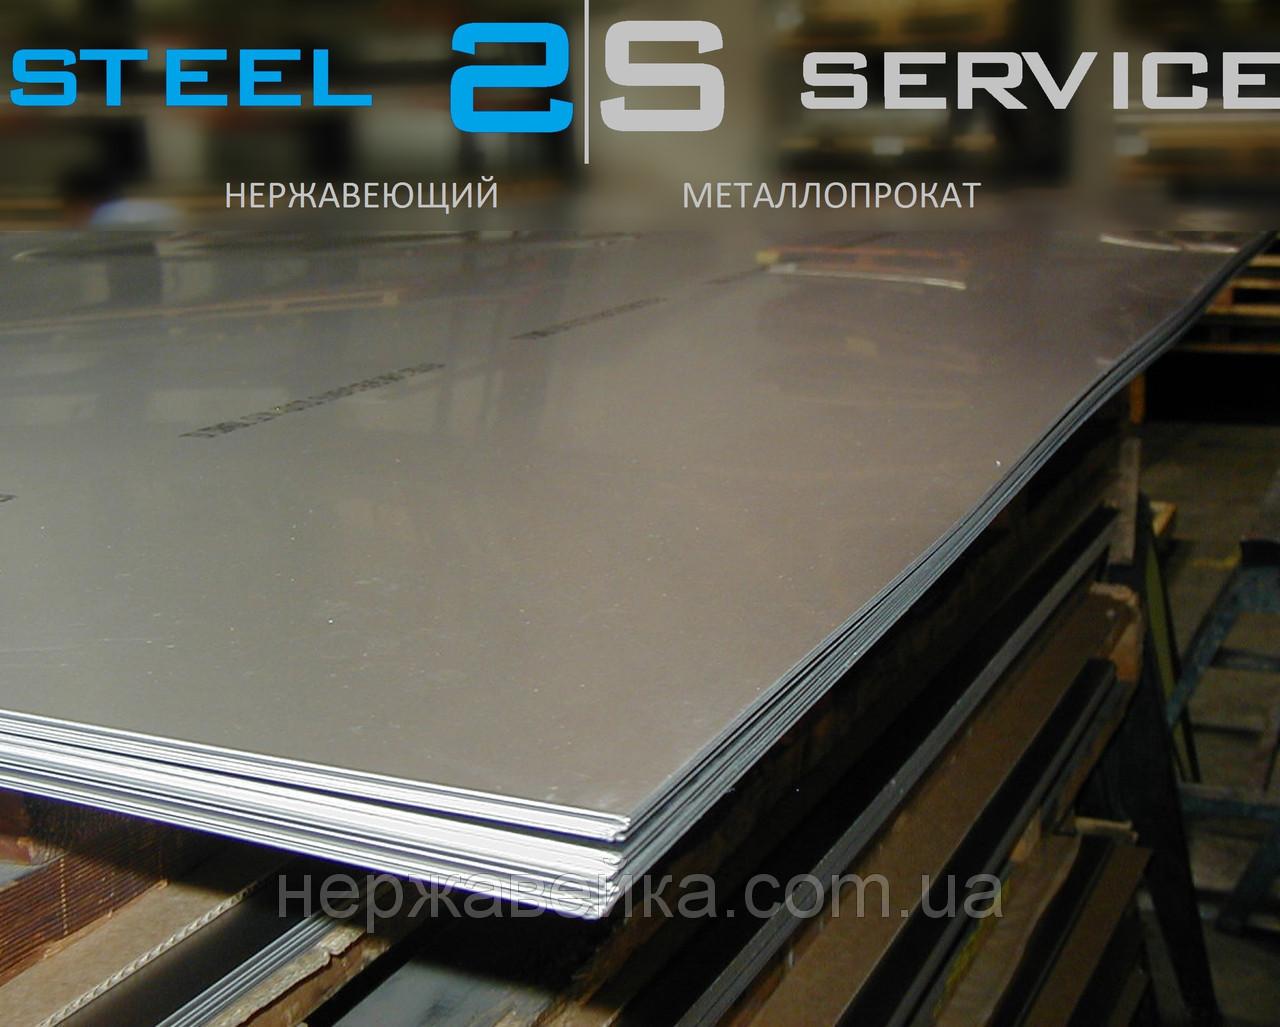 Нержавейка лист 0,8х1000х2000мм AISI 430(12Х17) BA - зеркало, технический